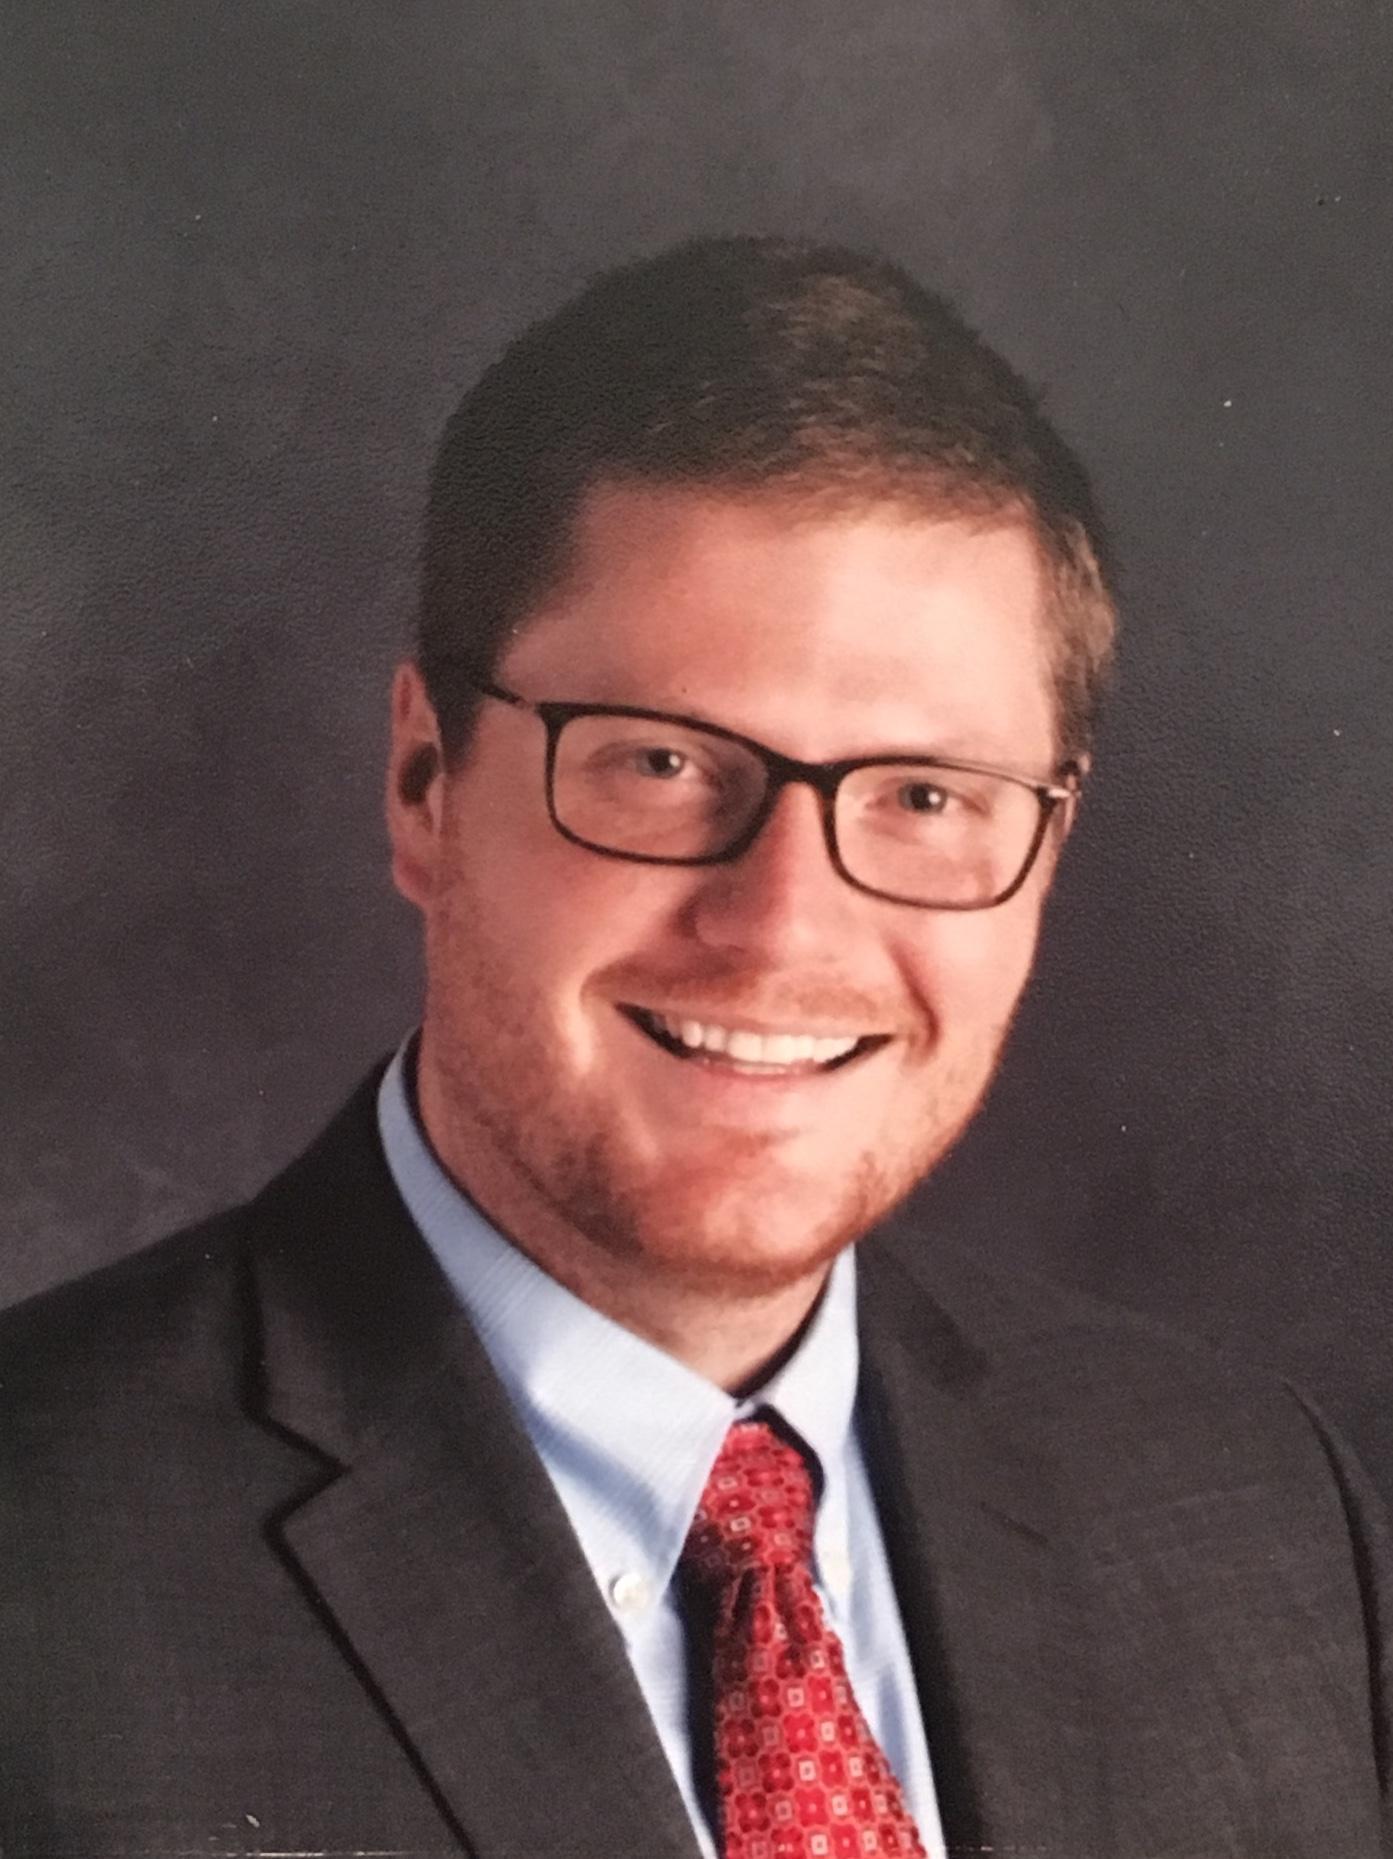 Principal Jim LeBlanc